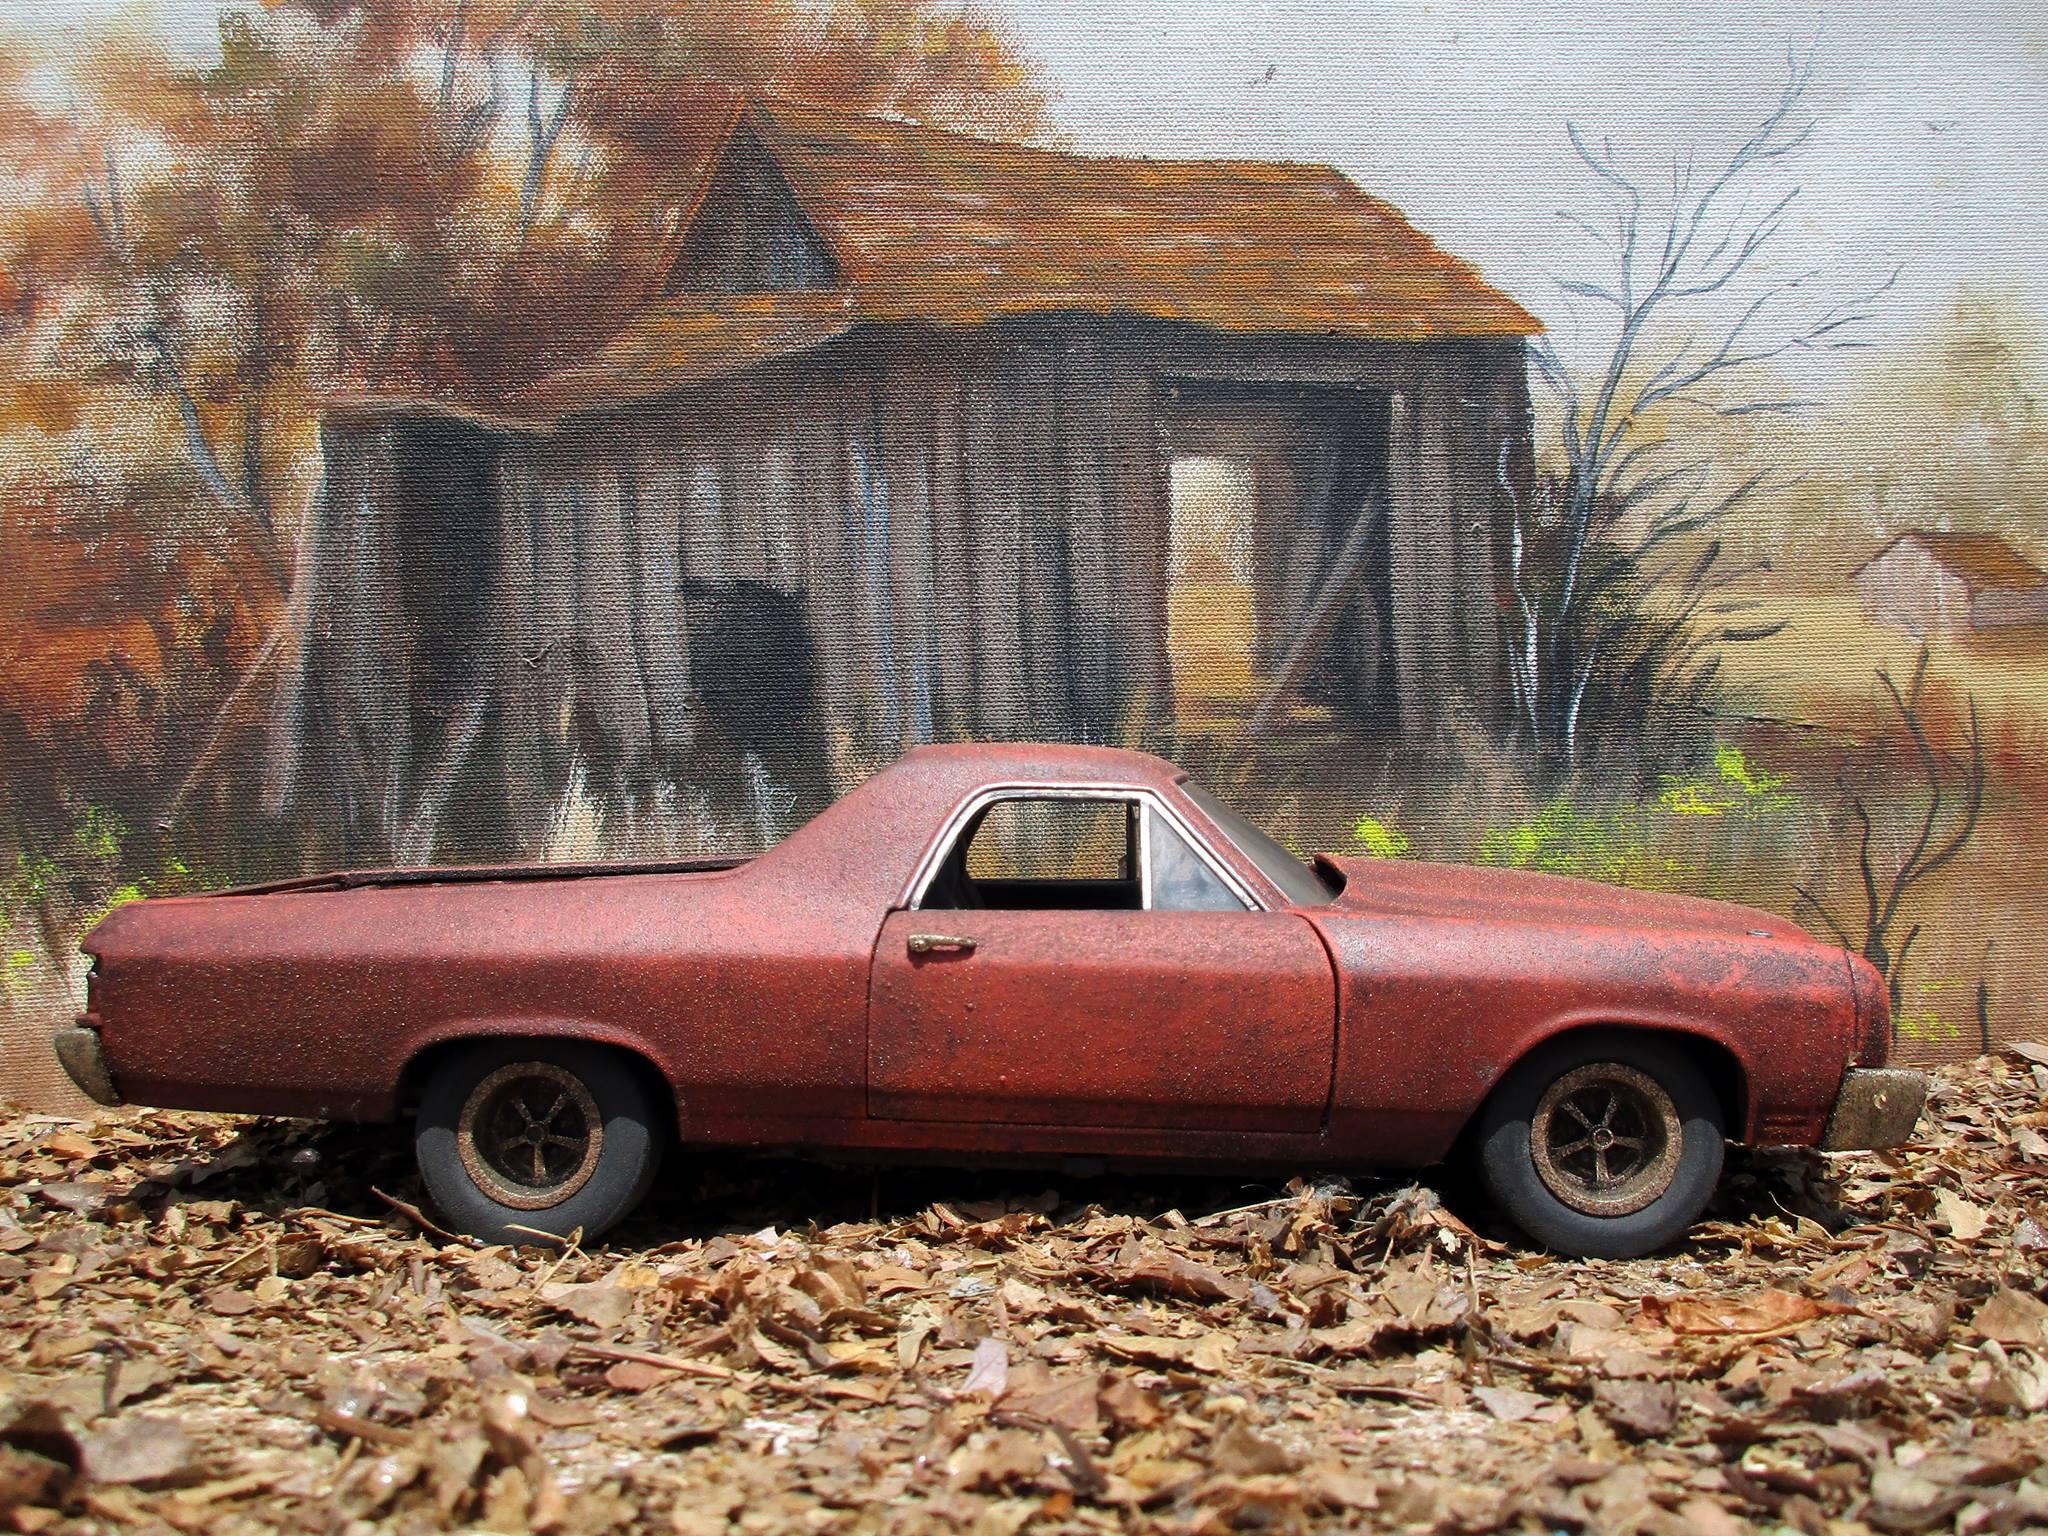 Chevy-elcamino-1971-7